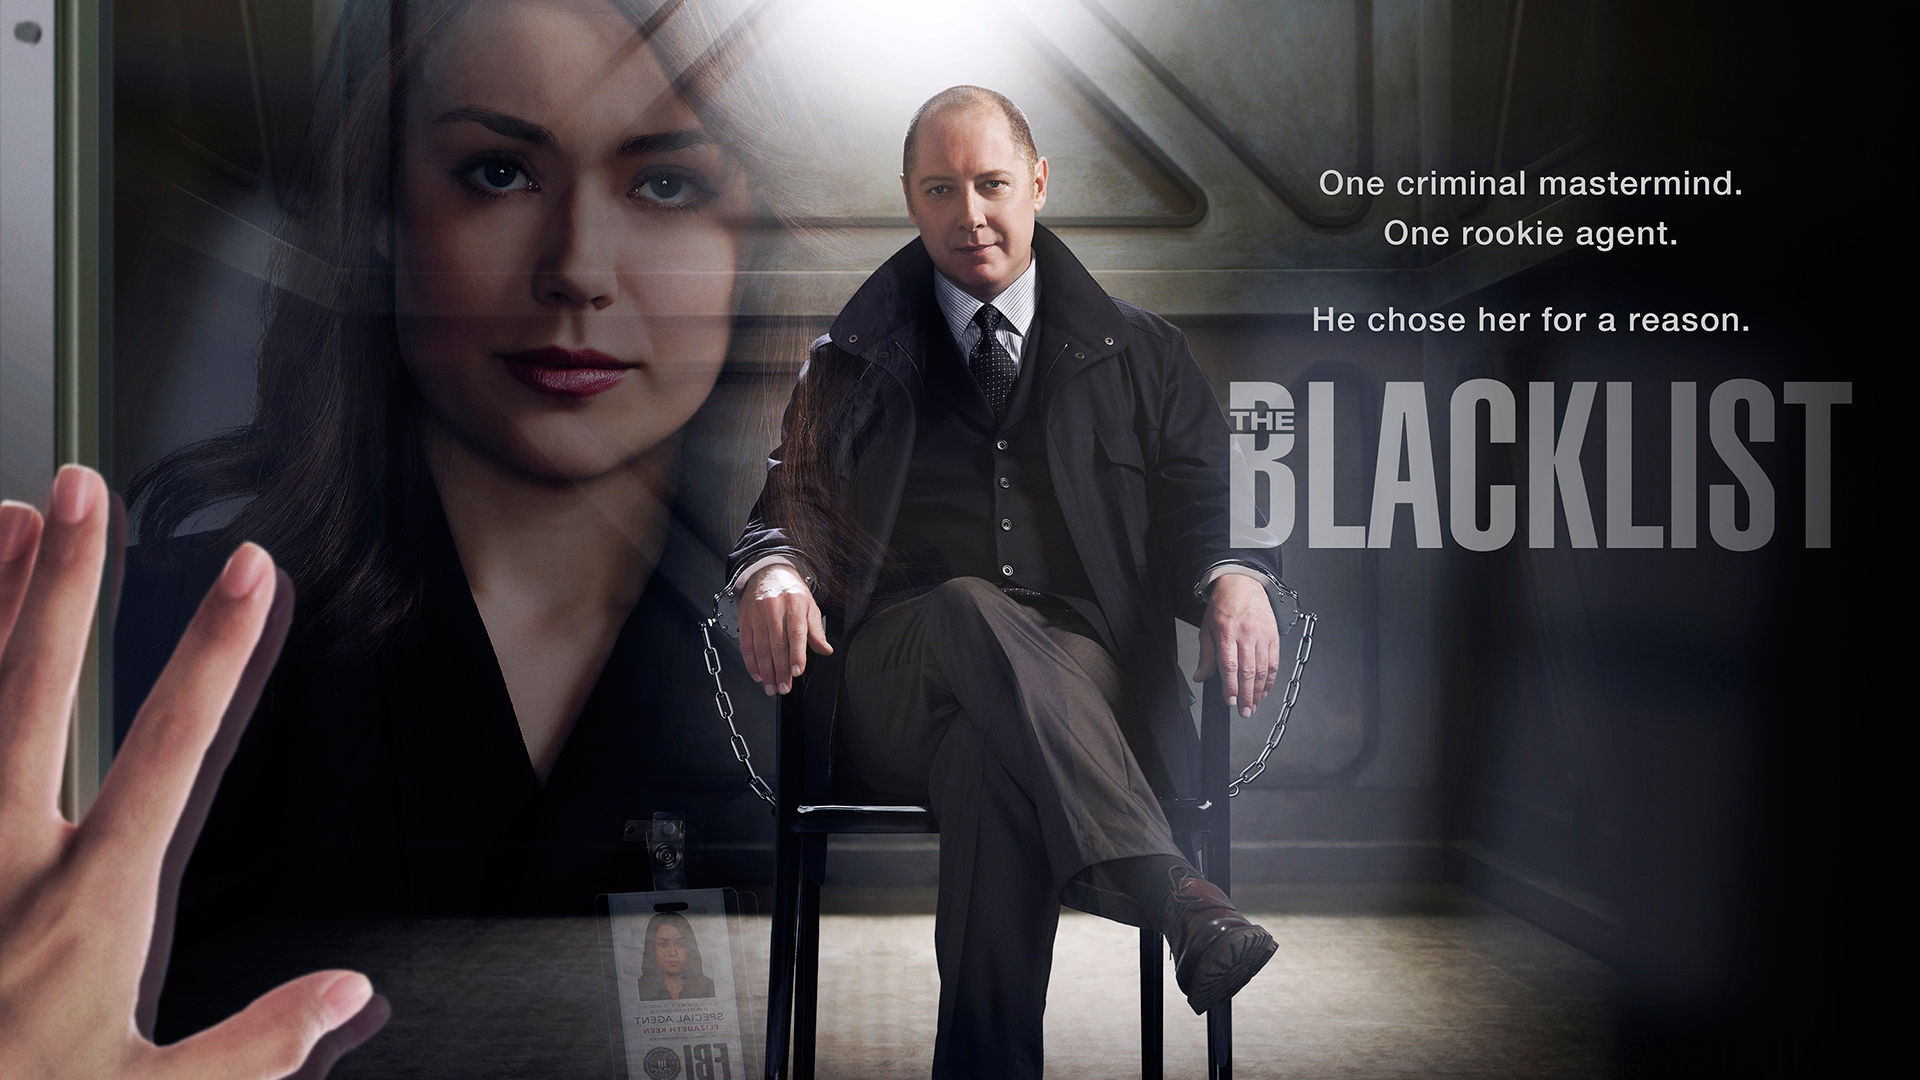 The Blacklist   The Blacklist Wallpaper 35676707 1920x1080